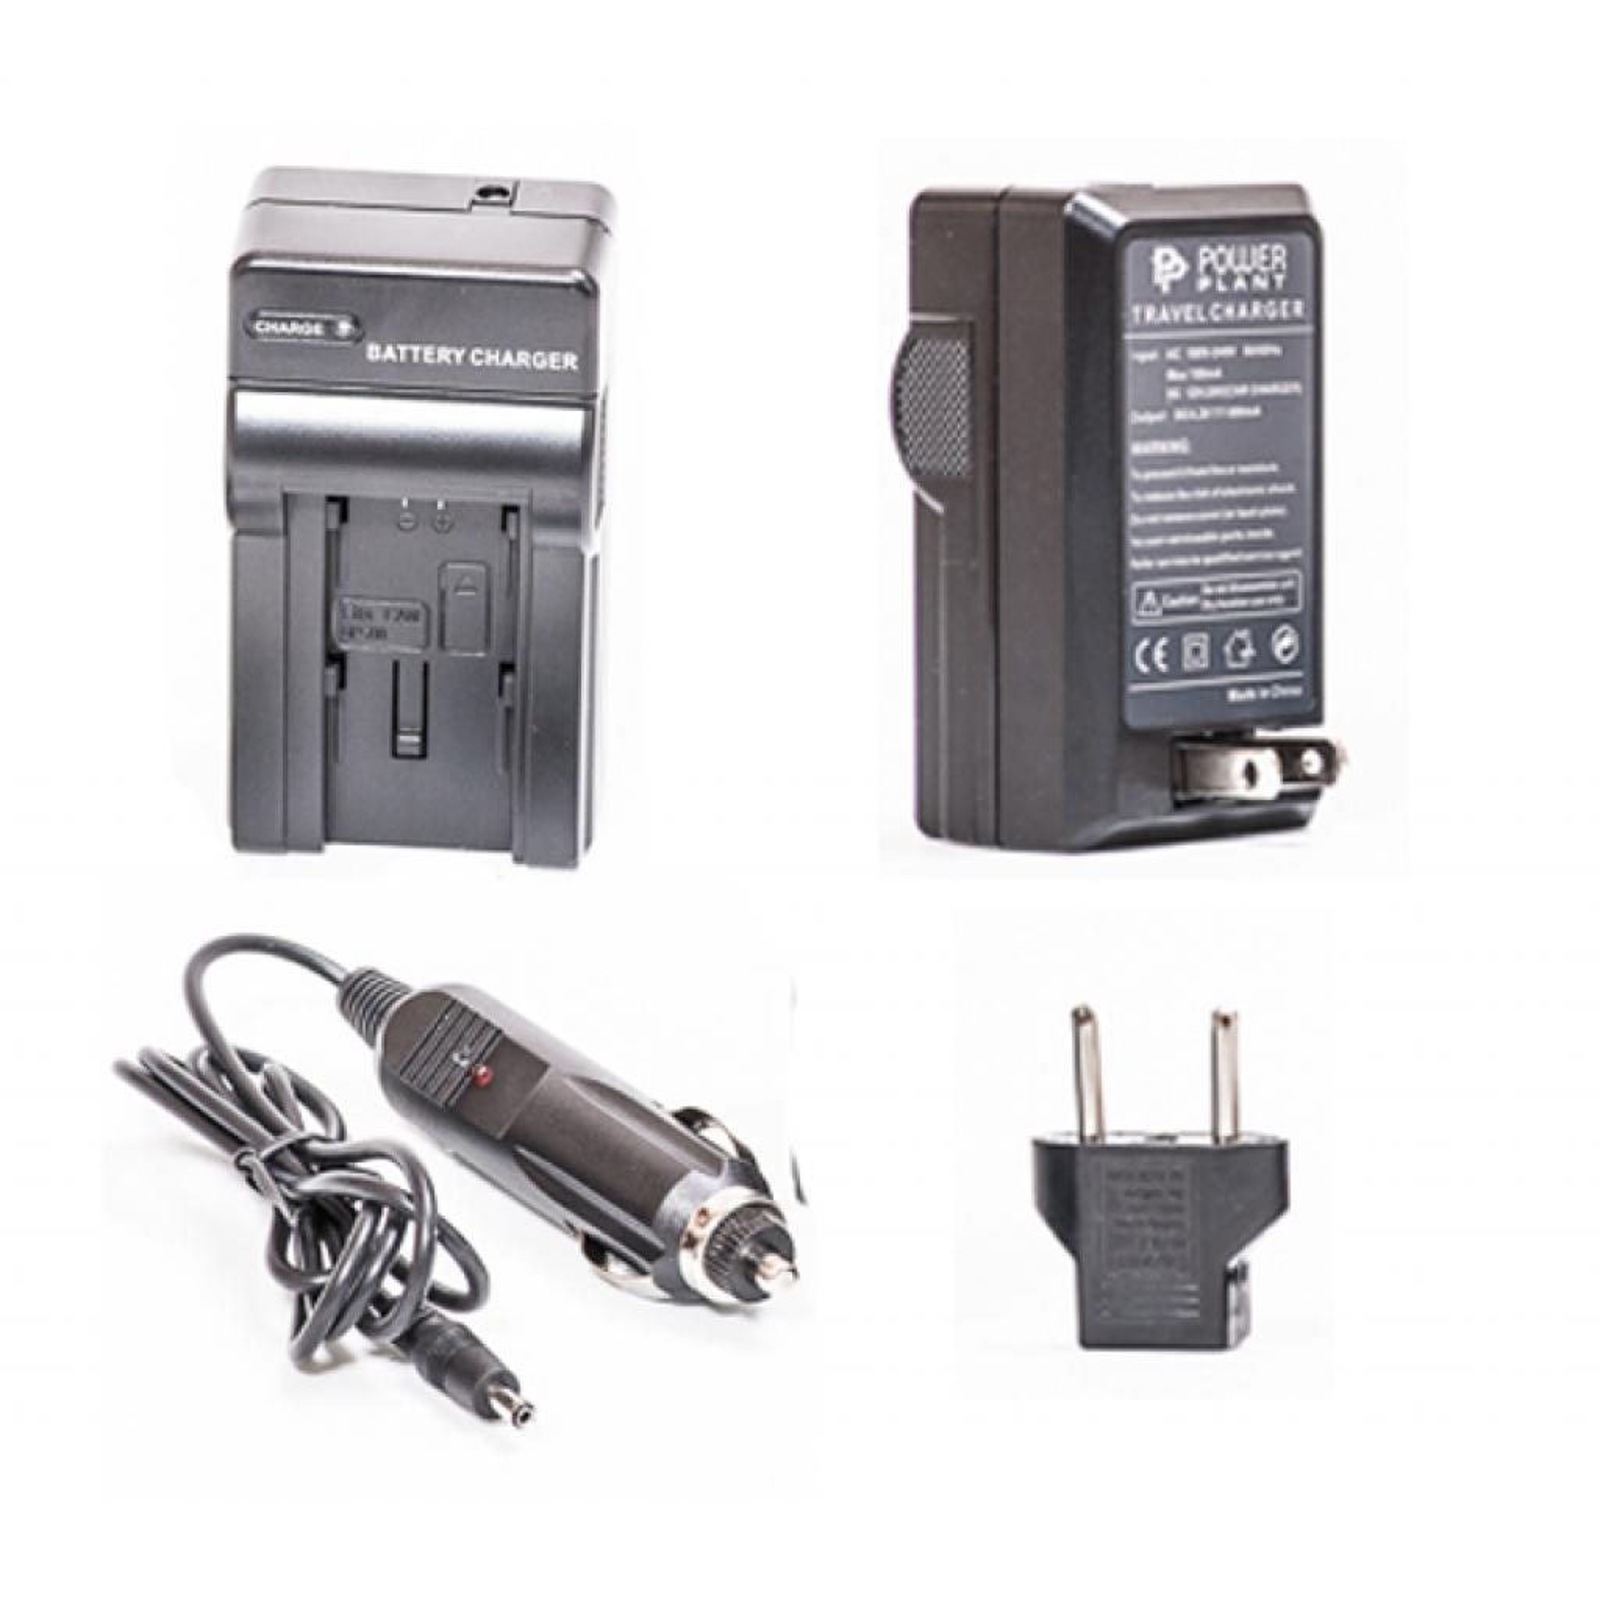 Аккумулятор к фото/видео PowerPlant Canon BP-110 (DV00DV1329) изображение 3